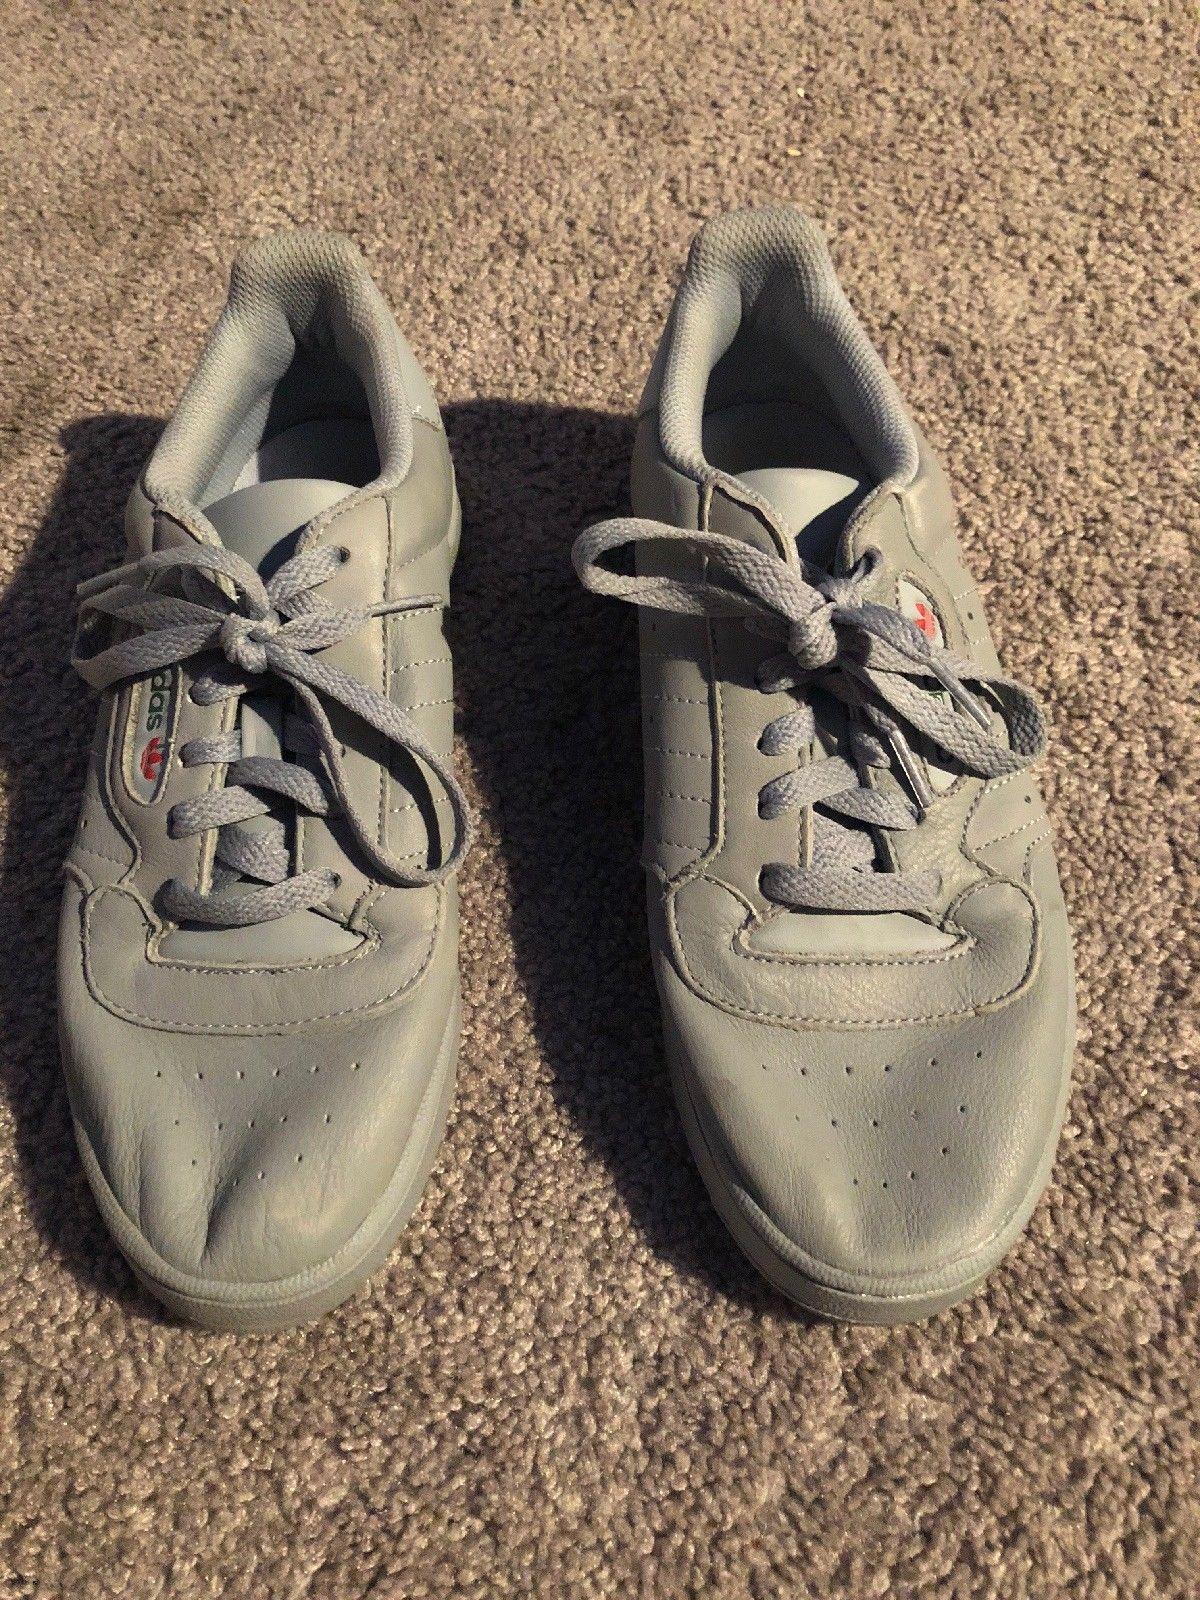 a369c9578 Adidas Yeezy Powerphase Calabasas Grey Size 7.5 CG6422 100 ...